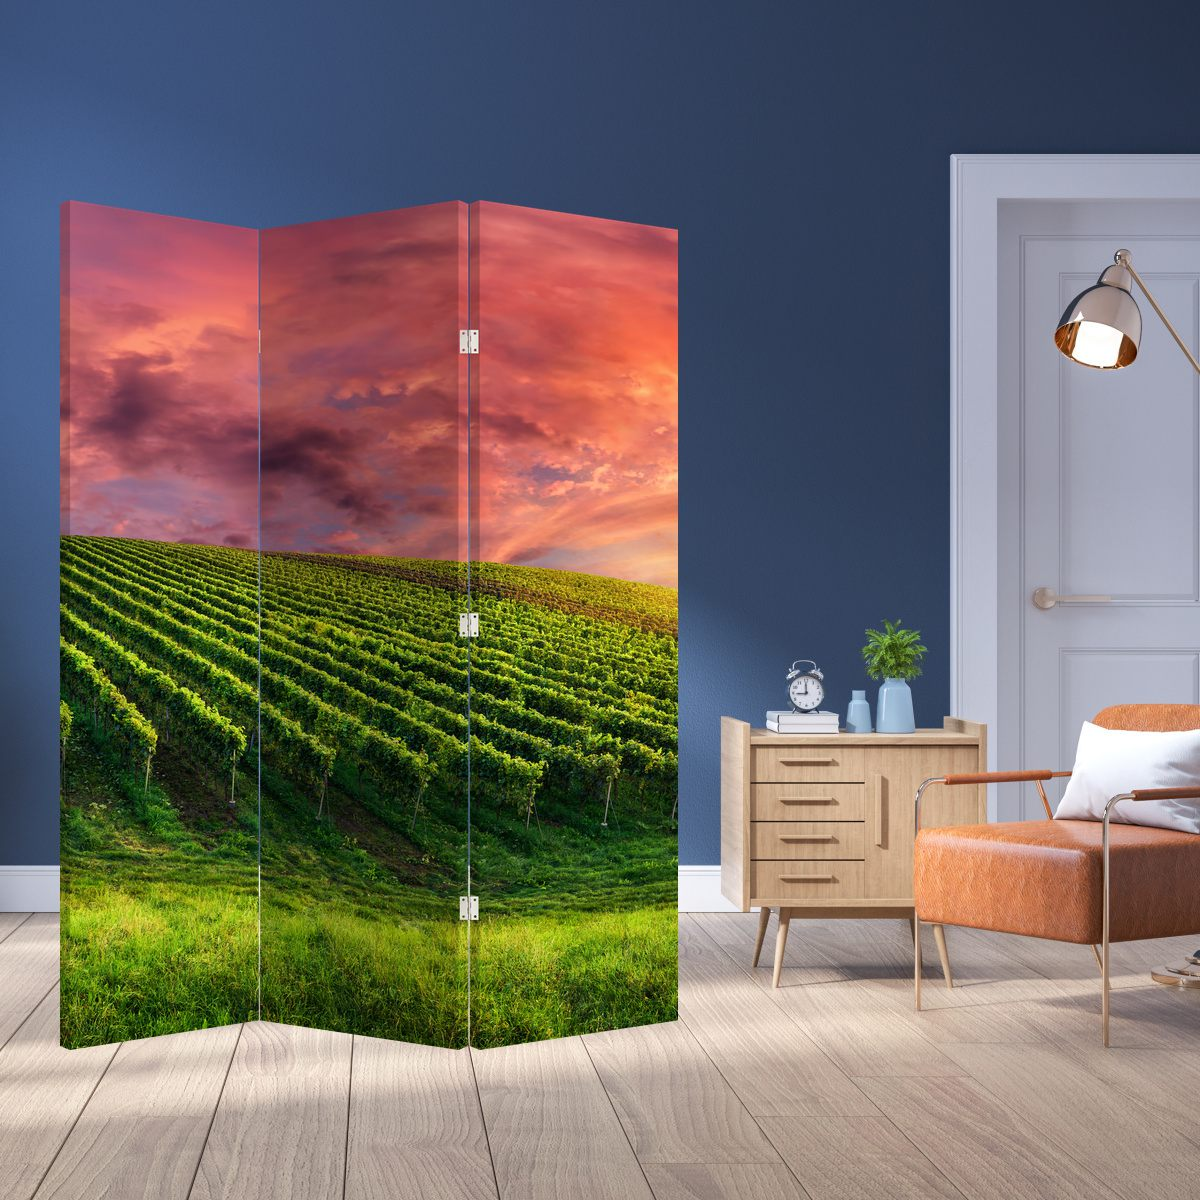 Paraván - Vinohrad s barevným nebem (P020336P135180)